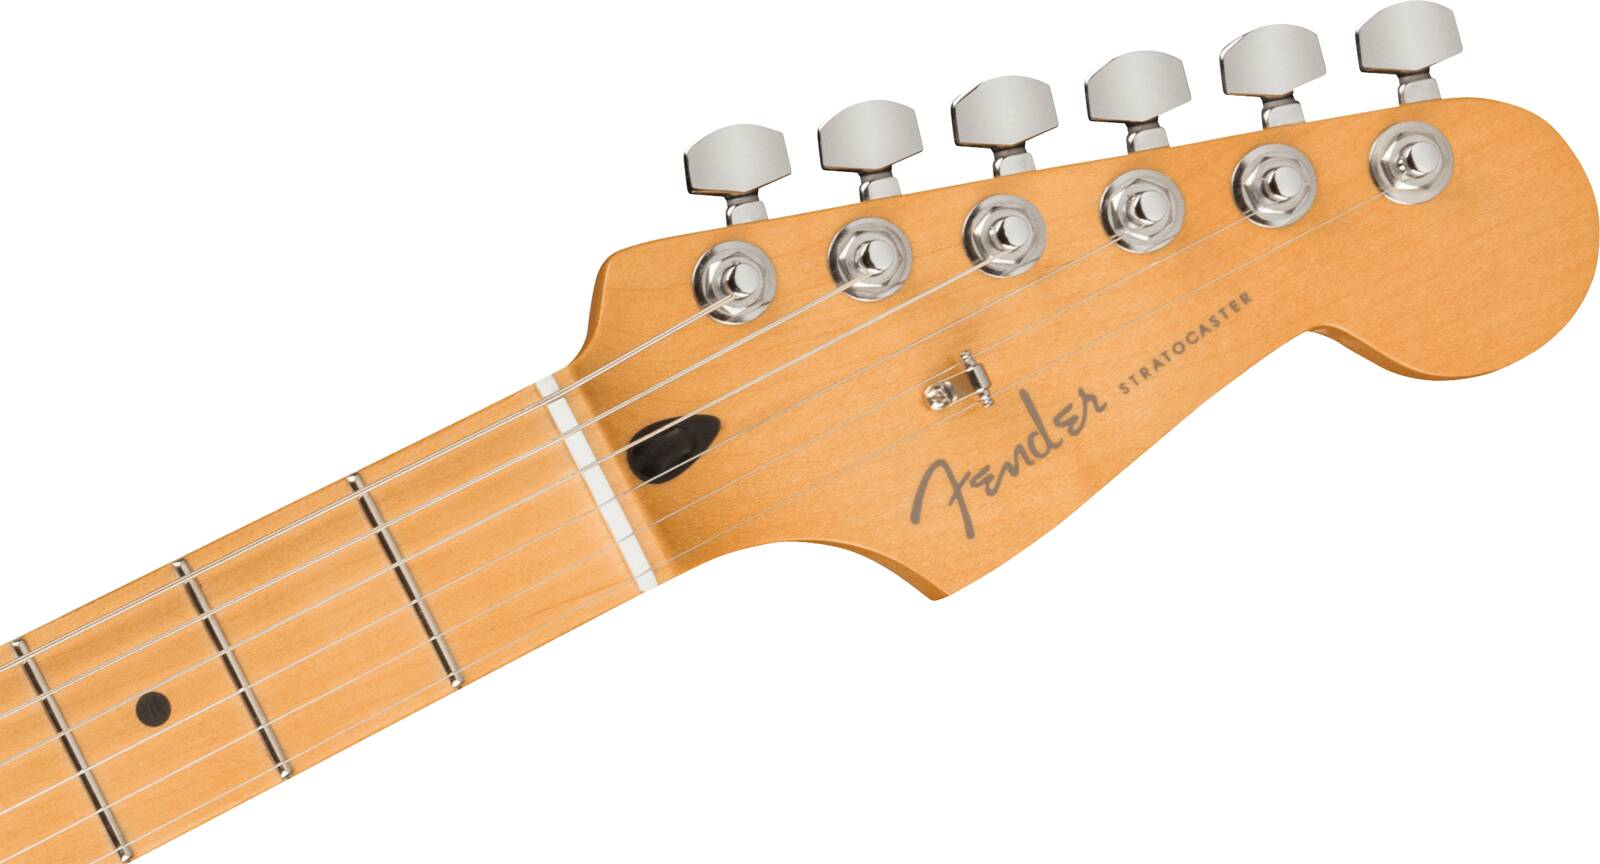 Fender Player Plus Stratocaster HSS, Maple Fingerboard, 3-Color Sunburst : photo 4